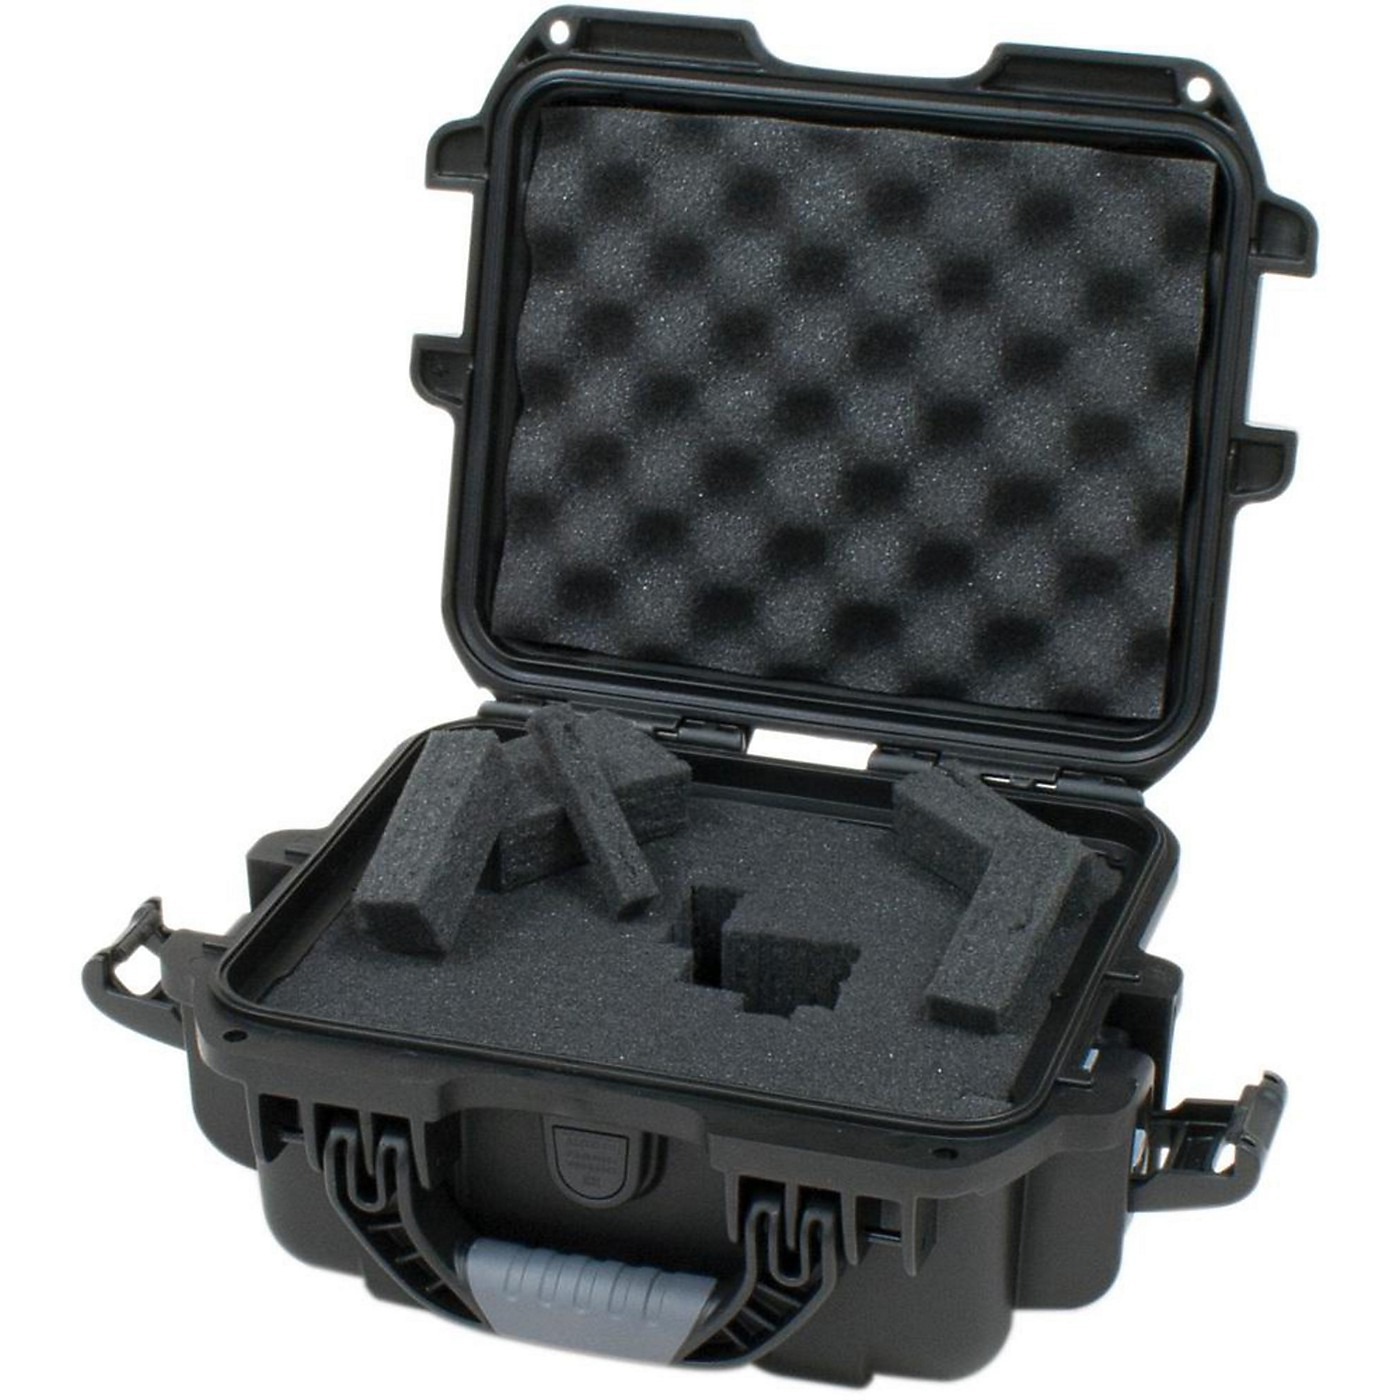 Gator GU-0907-05-WPDF Waterproof Injection Molded Case thumbnail